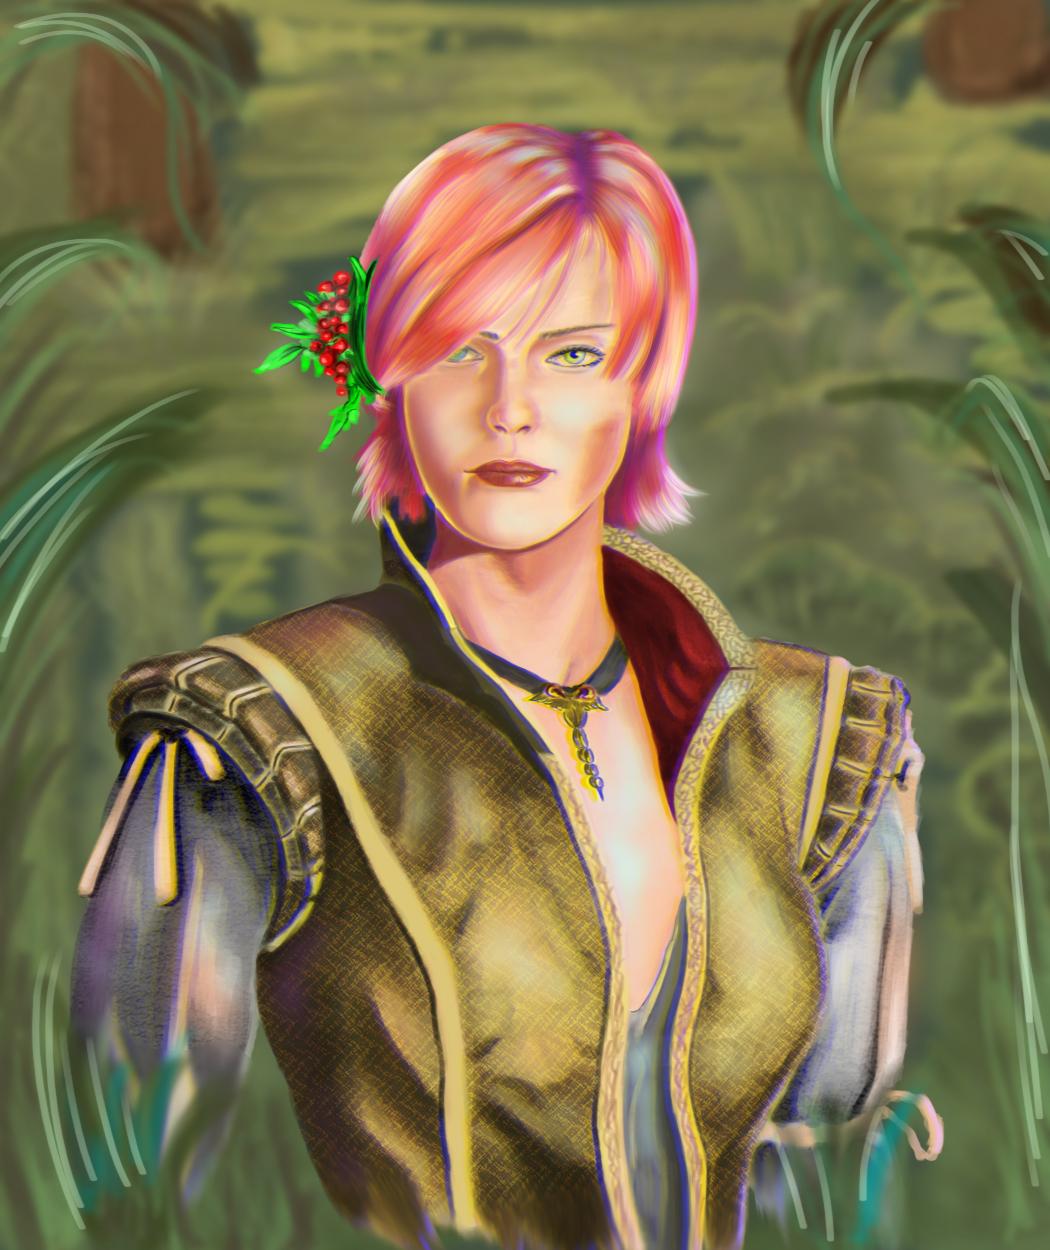 Shani FanArt - Witcher 3